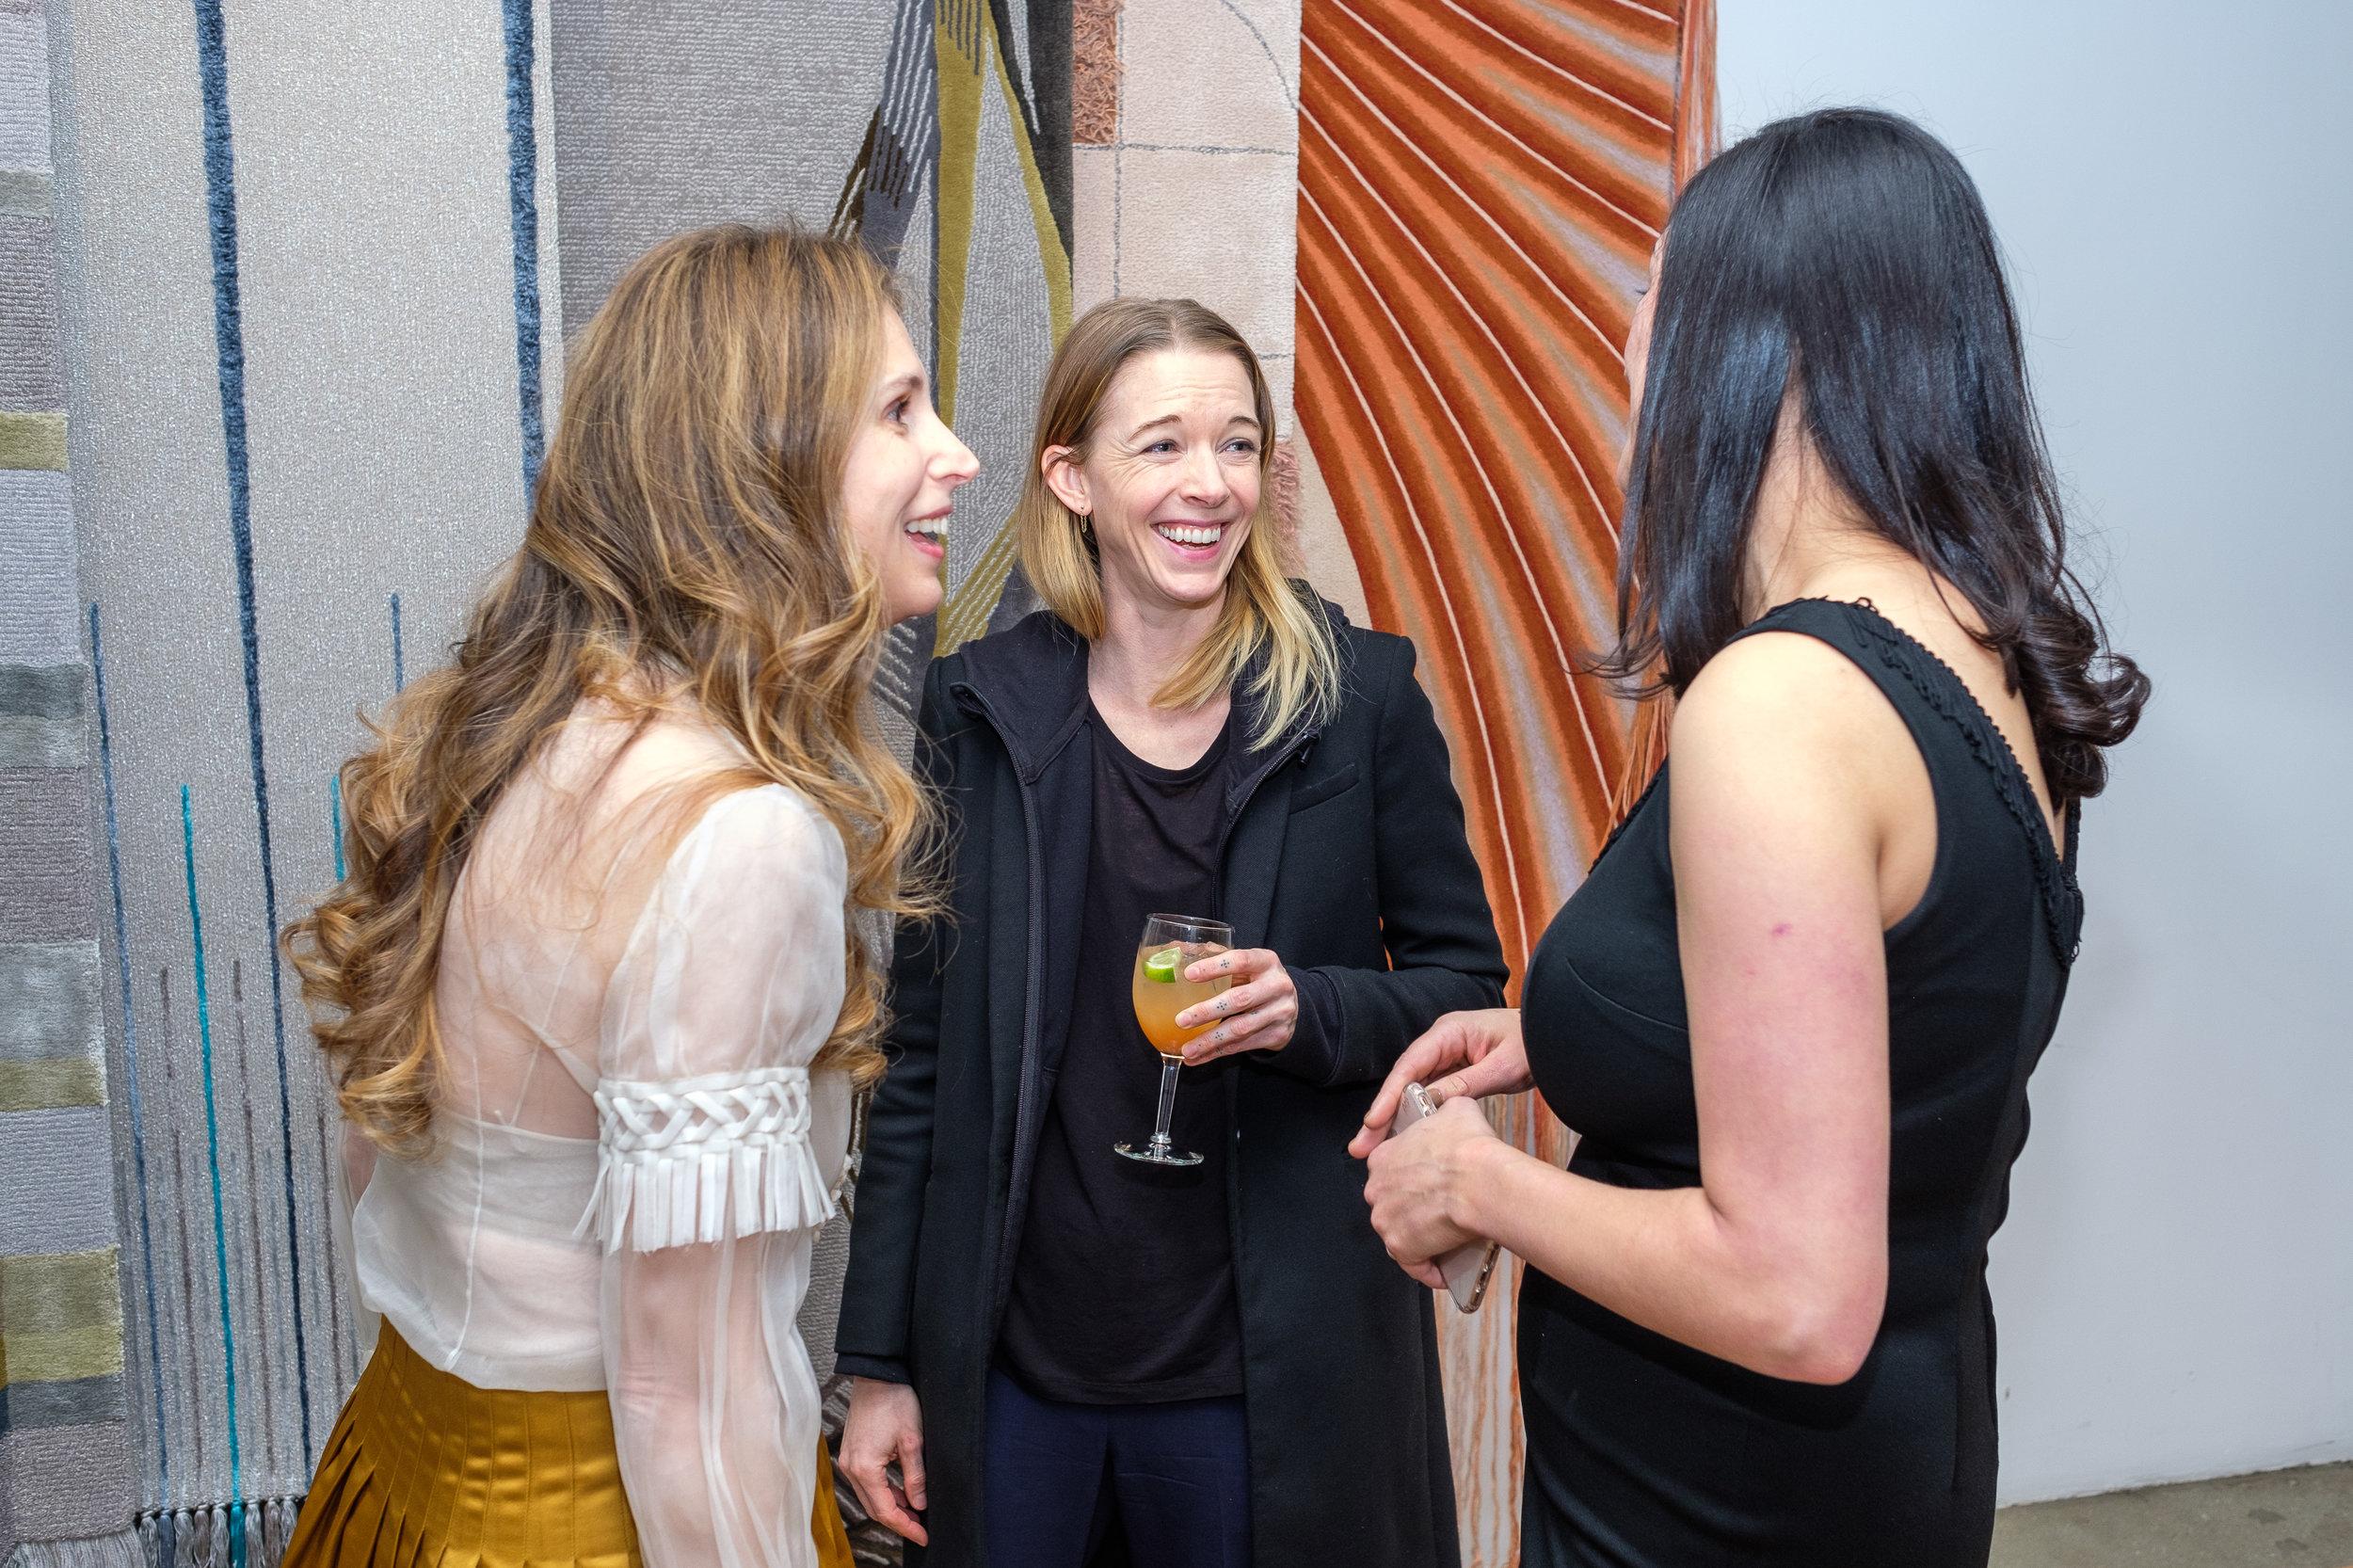 Juliana Polastri (Edward Fields), Bec Brittain (Bec Brittain), Ariana Massouh (Edward Fields)